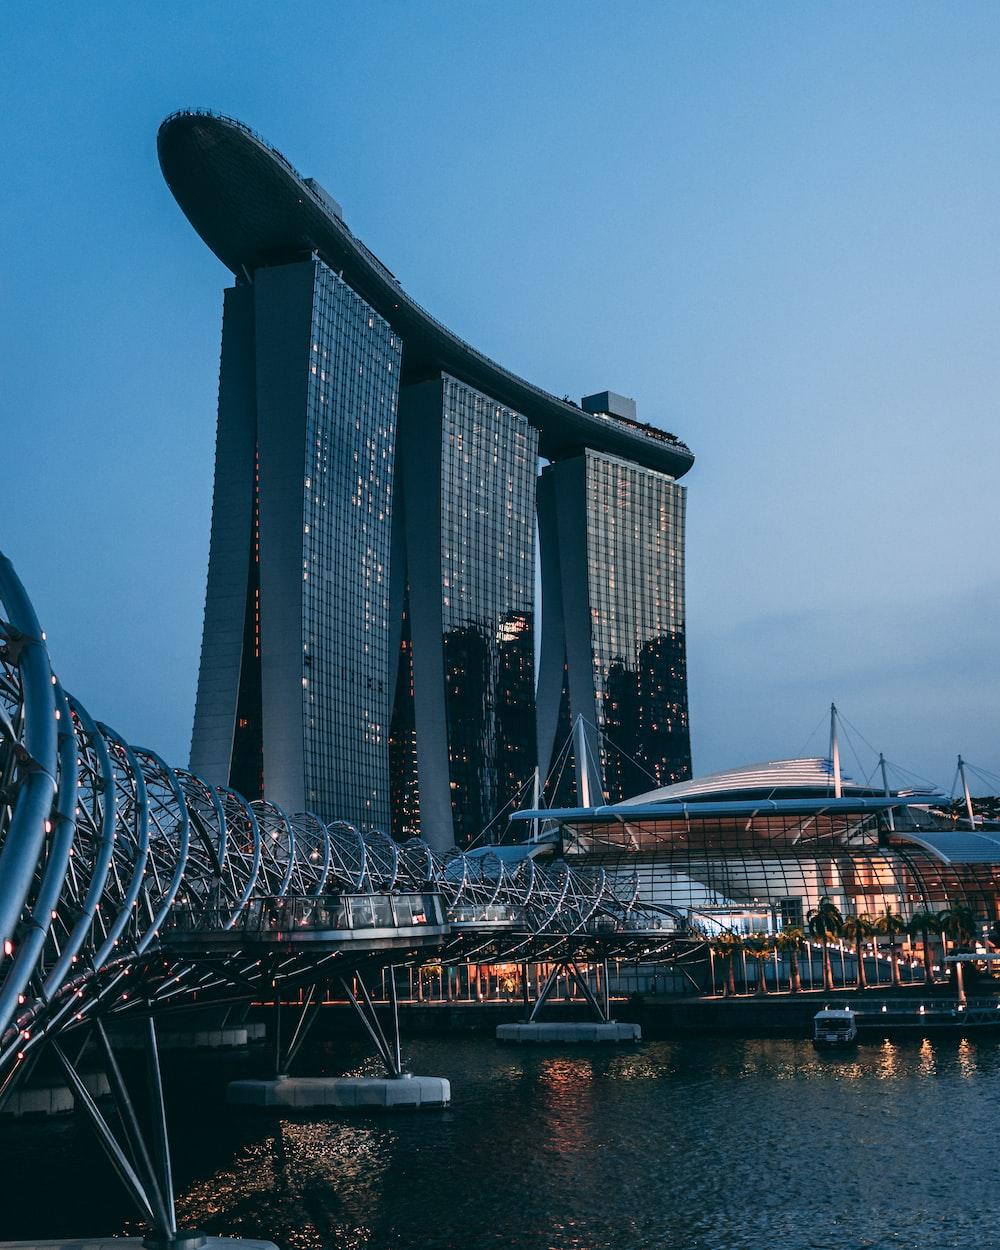 Marina Bay Sands building